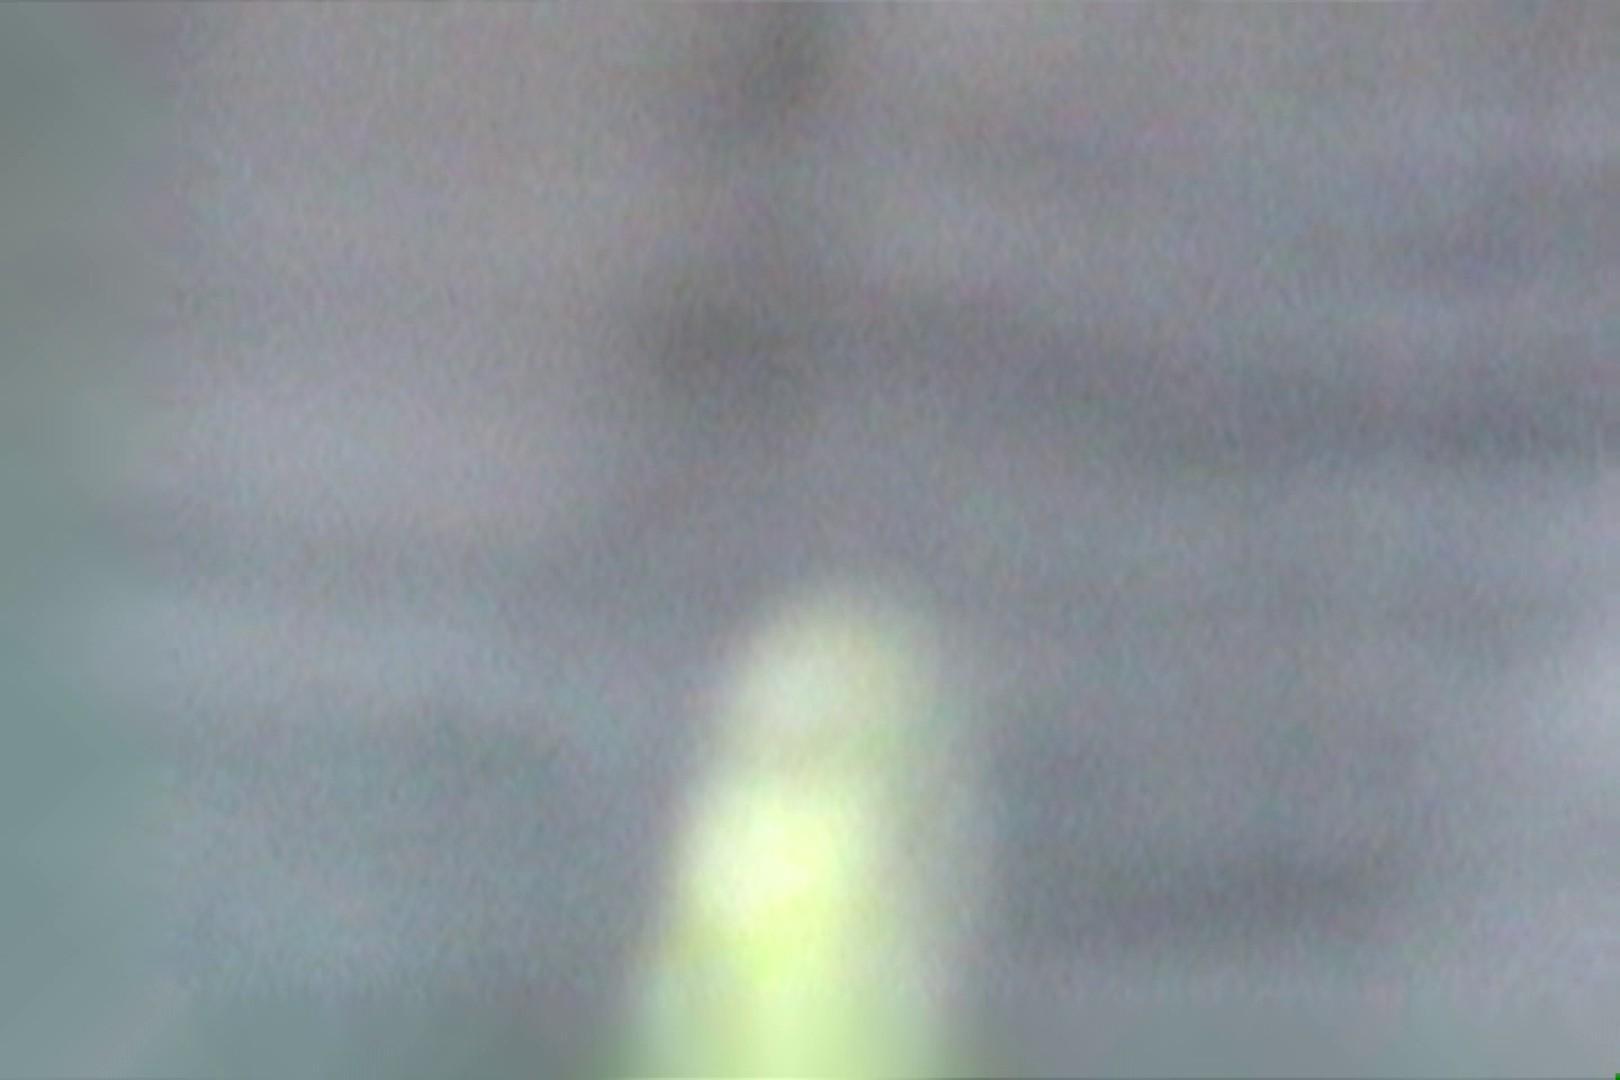 Aquaな露天風呂Vol.574 盗撮シリーズ | 露天風呂編  87PIX 77